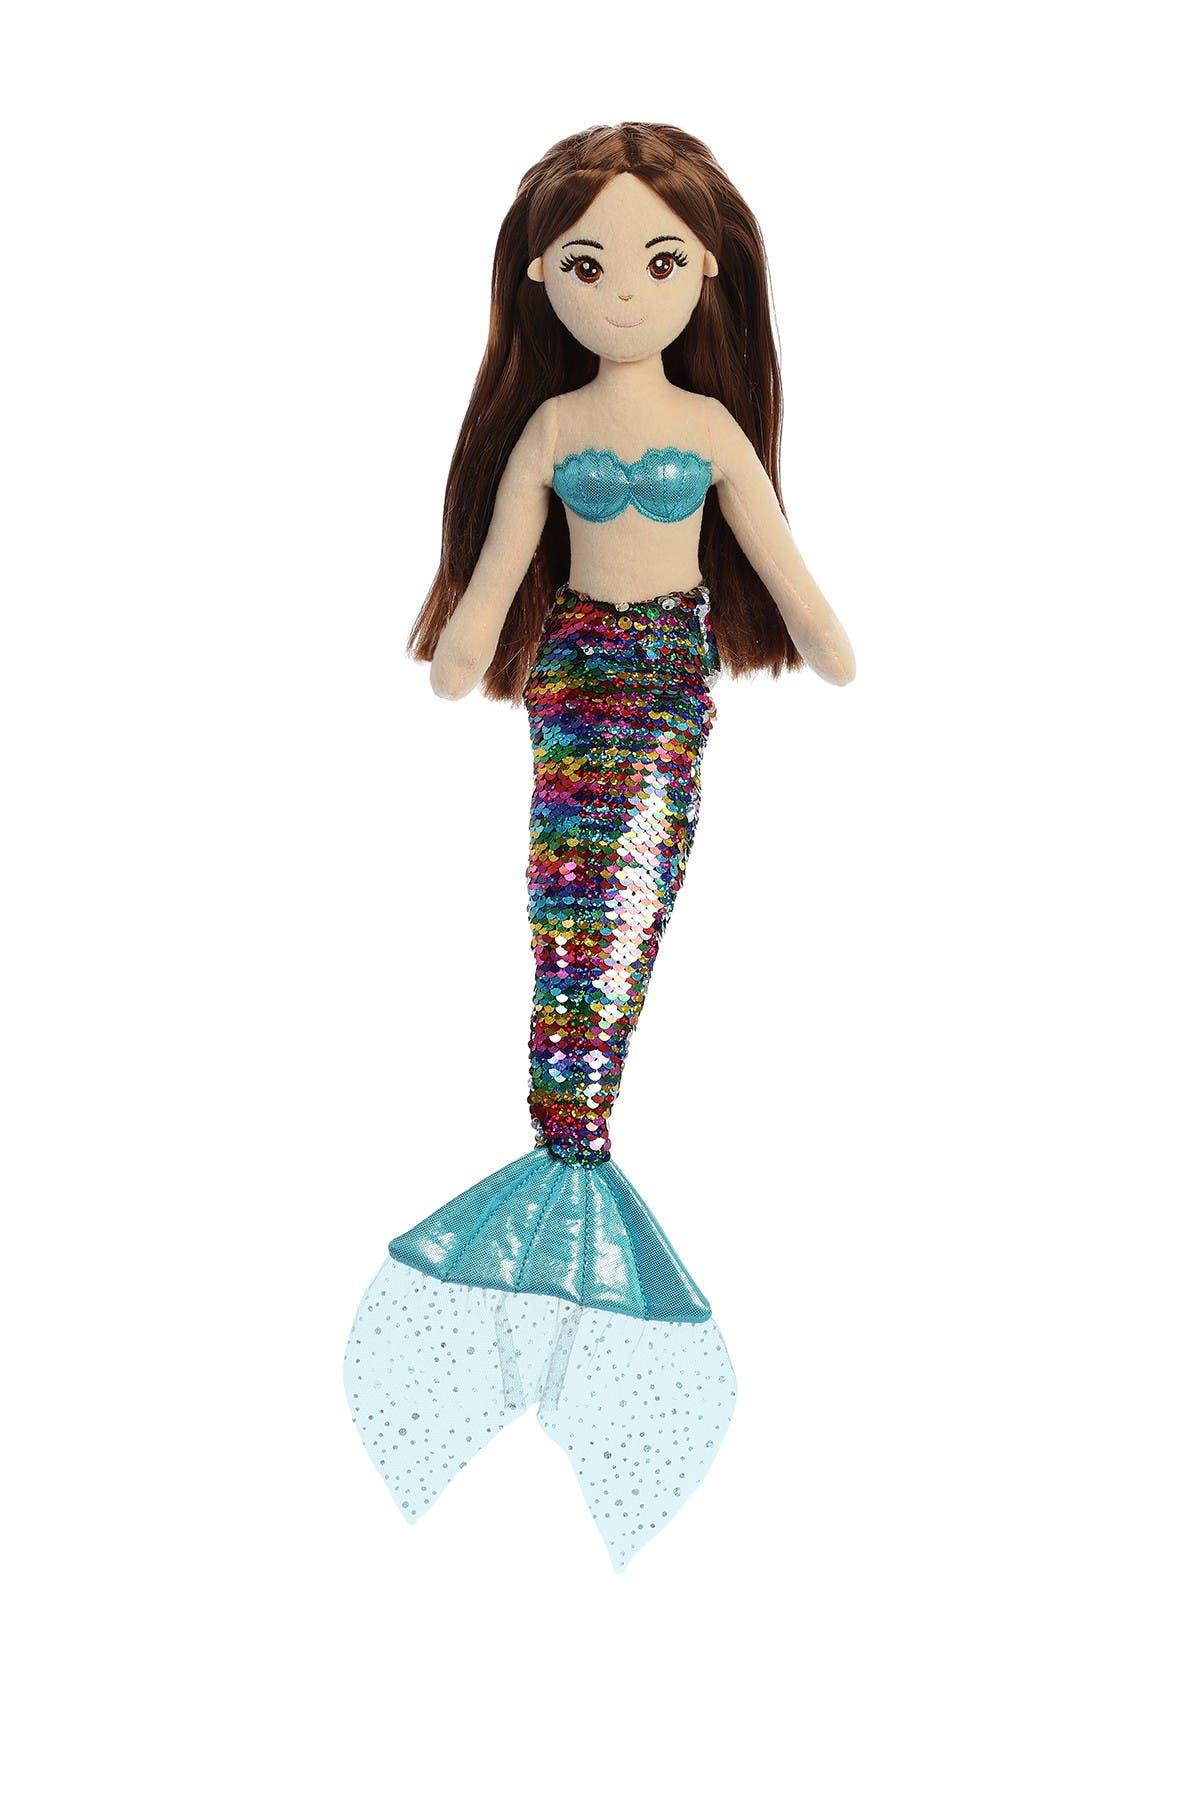 Image of Aurora World Toys Sequin Sparkles Mermaid